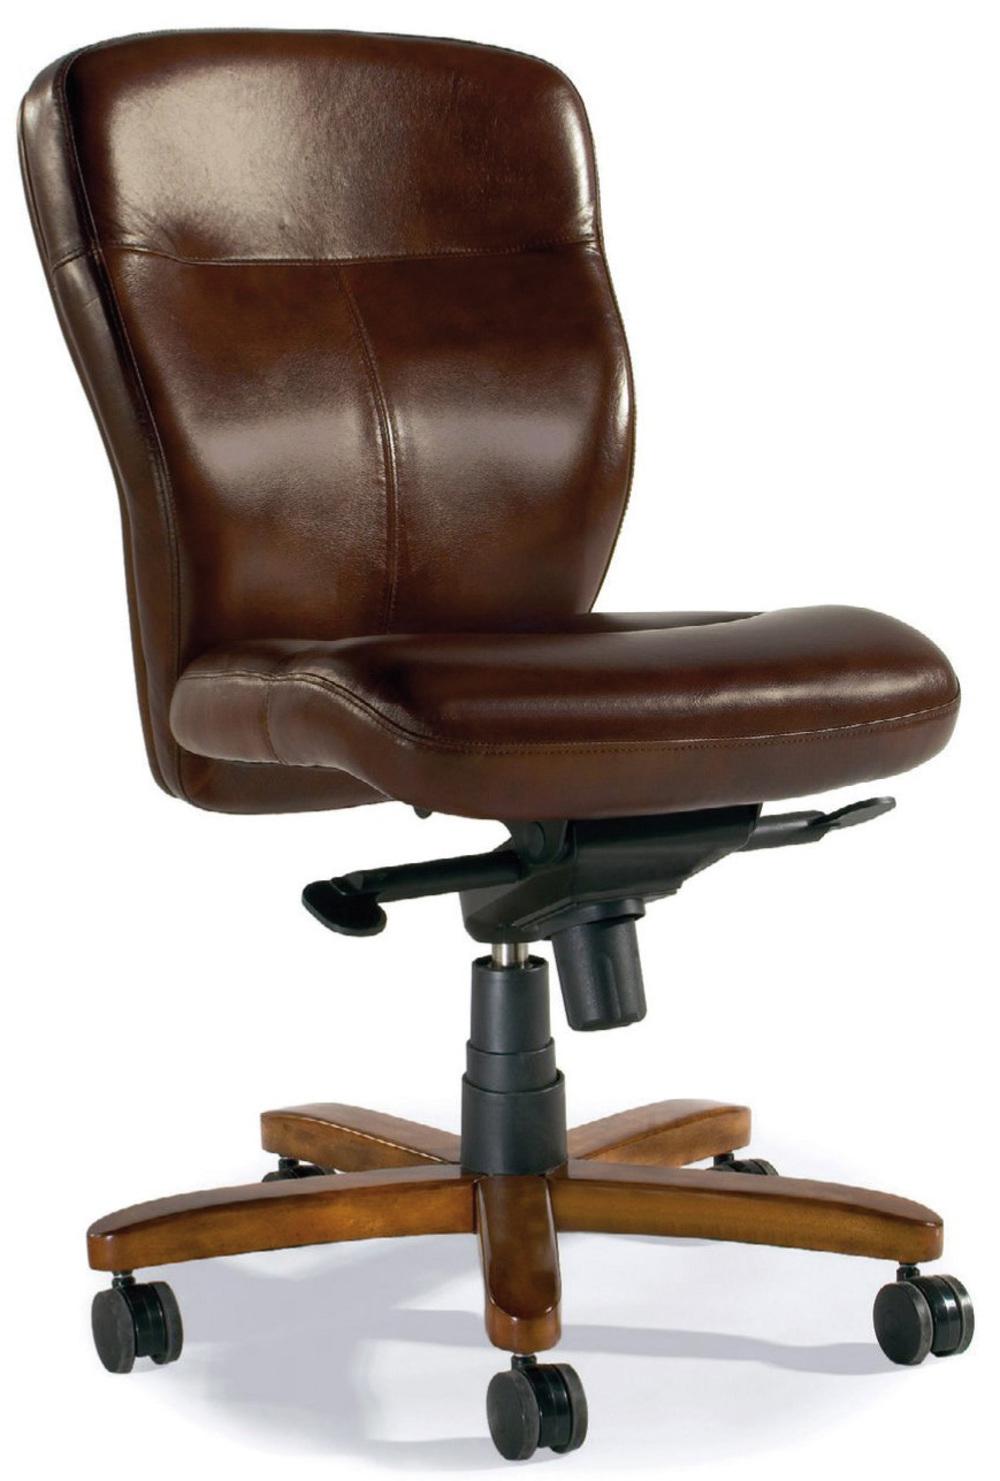 Hooker Furniture - Sasha Executive Swivel Tilt Chair